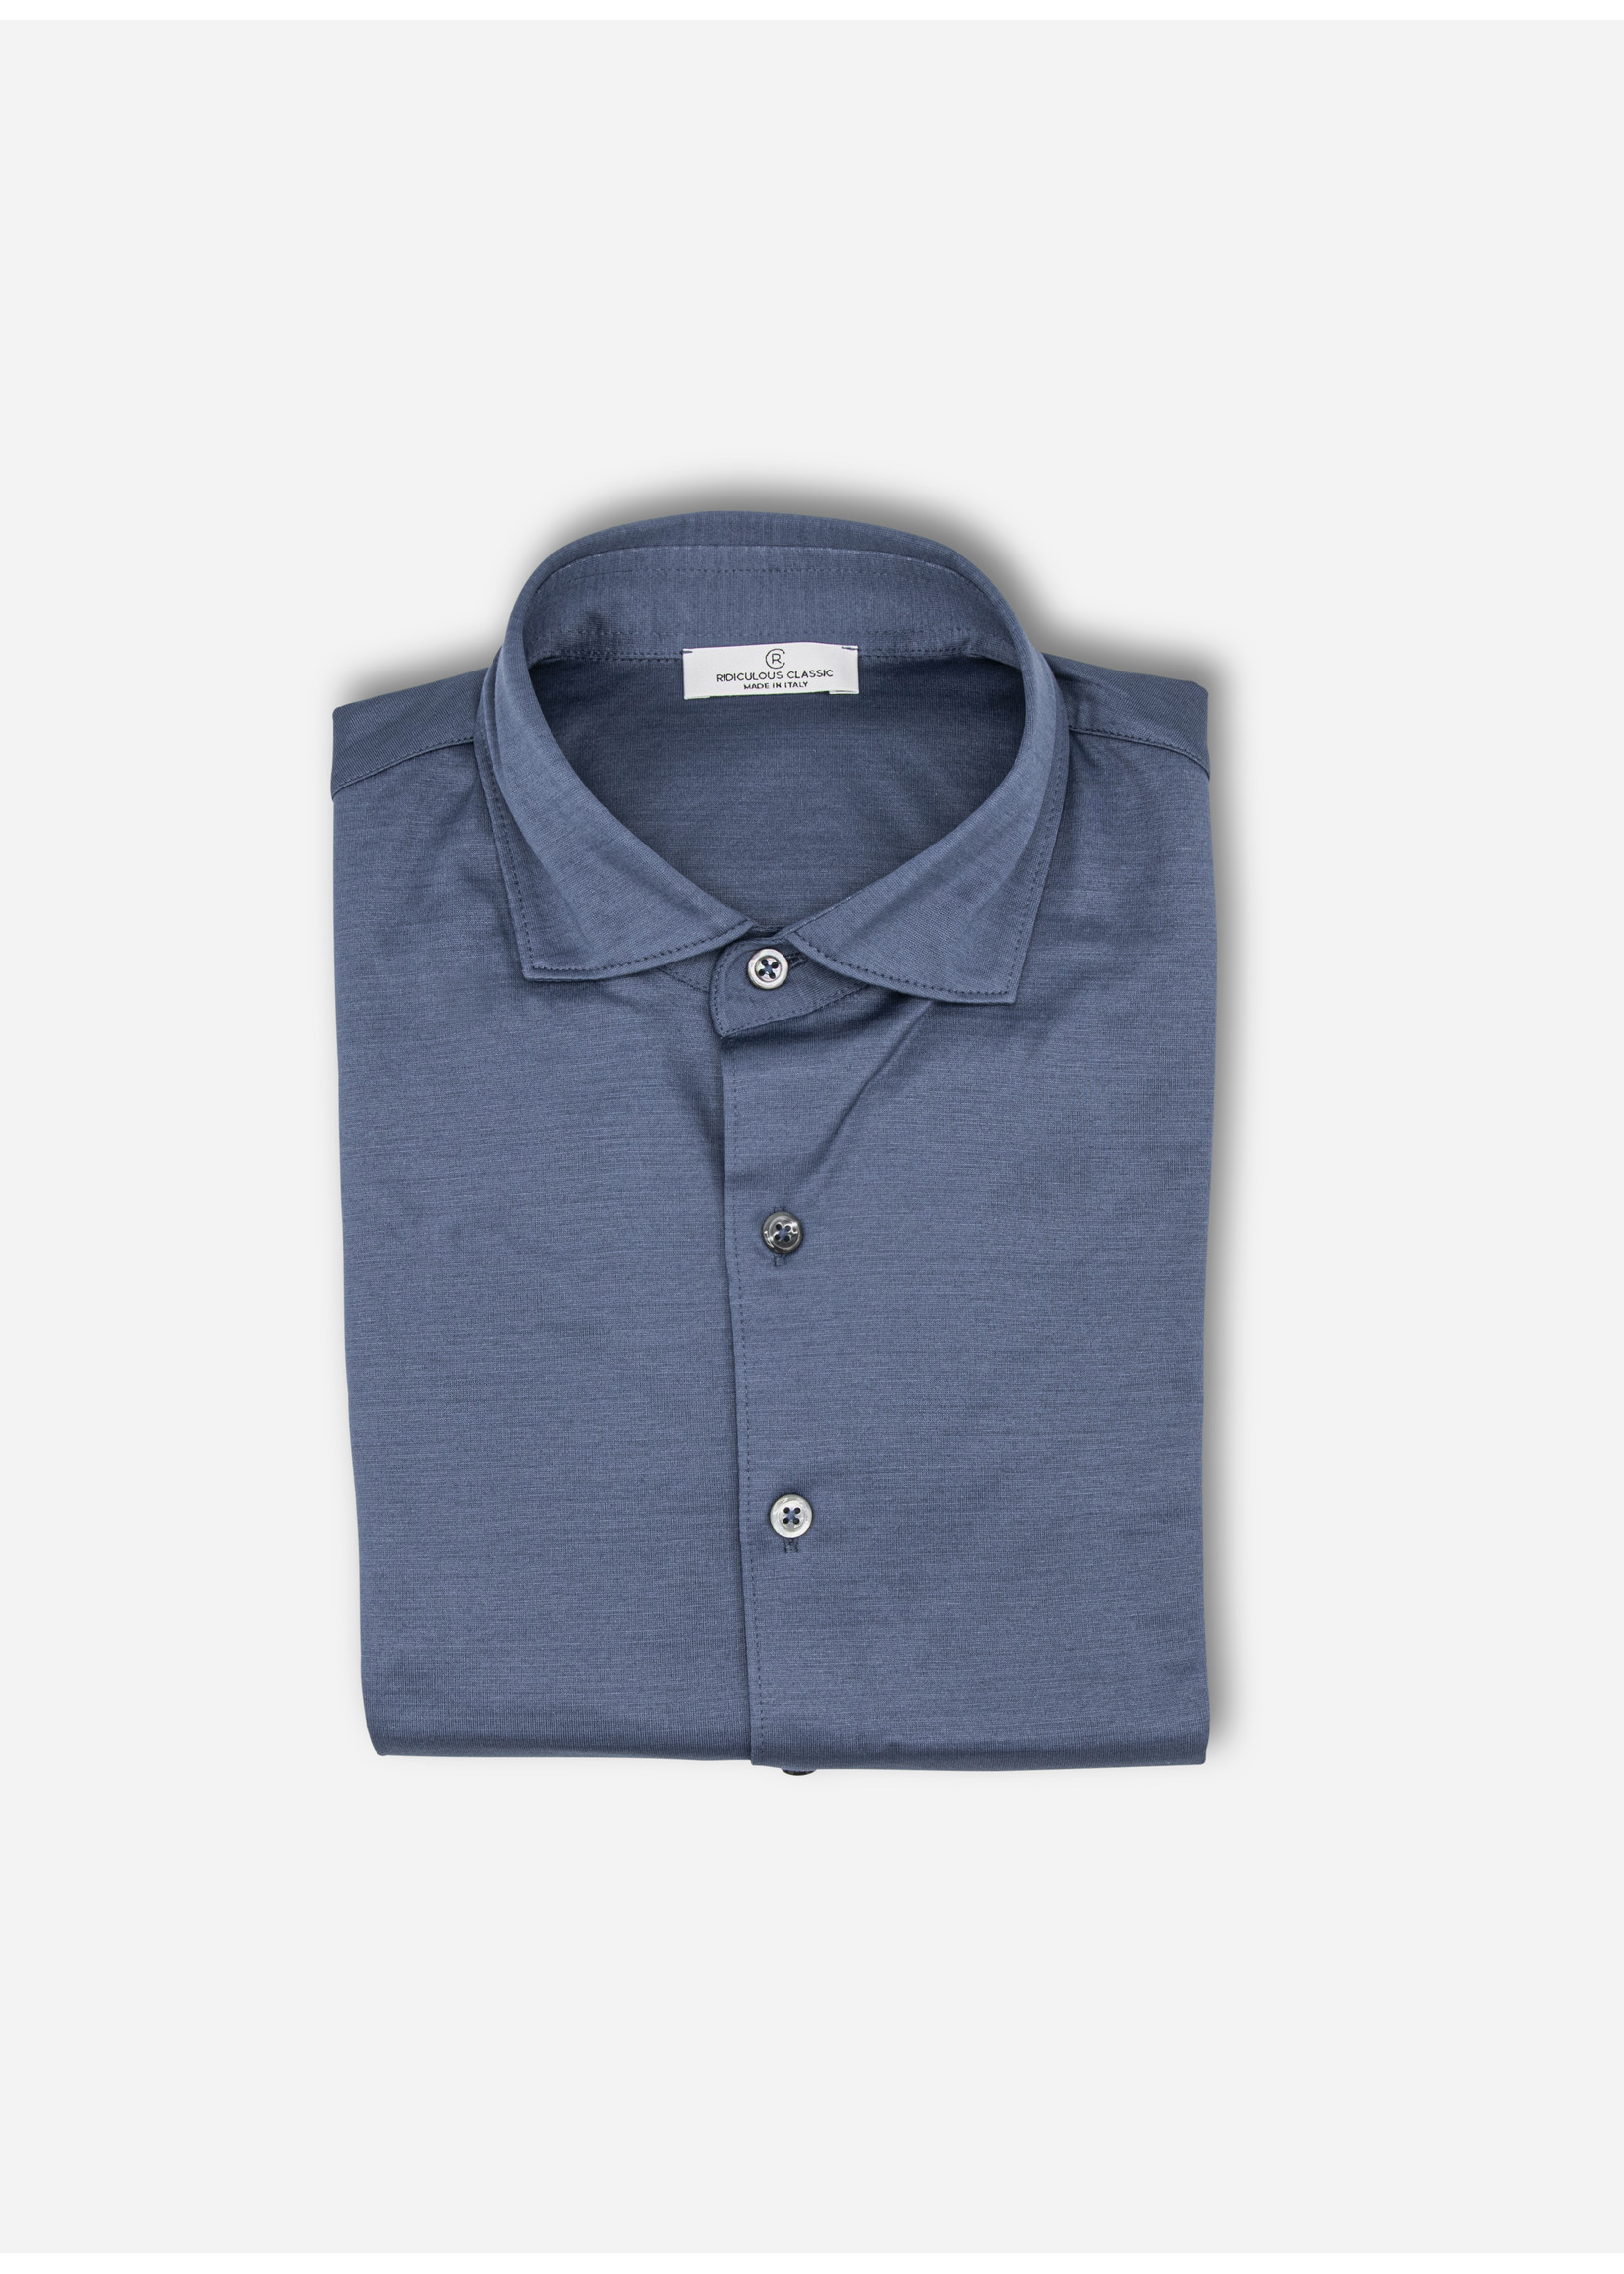 Ridiculous Classic Shirt north sea blue